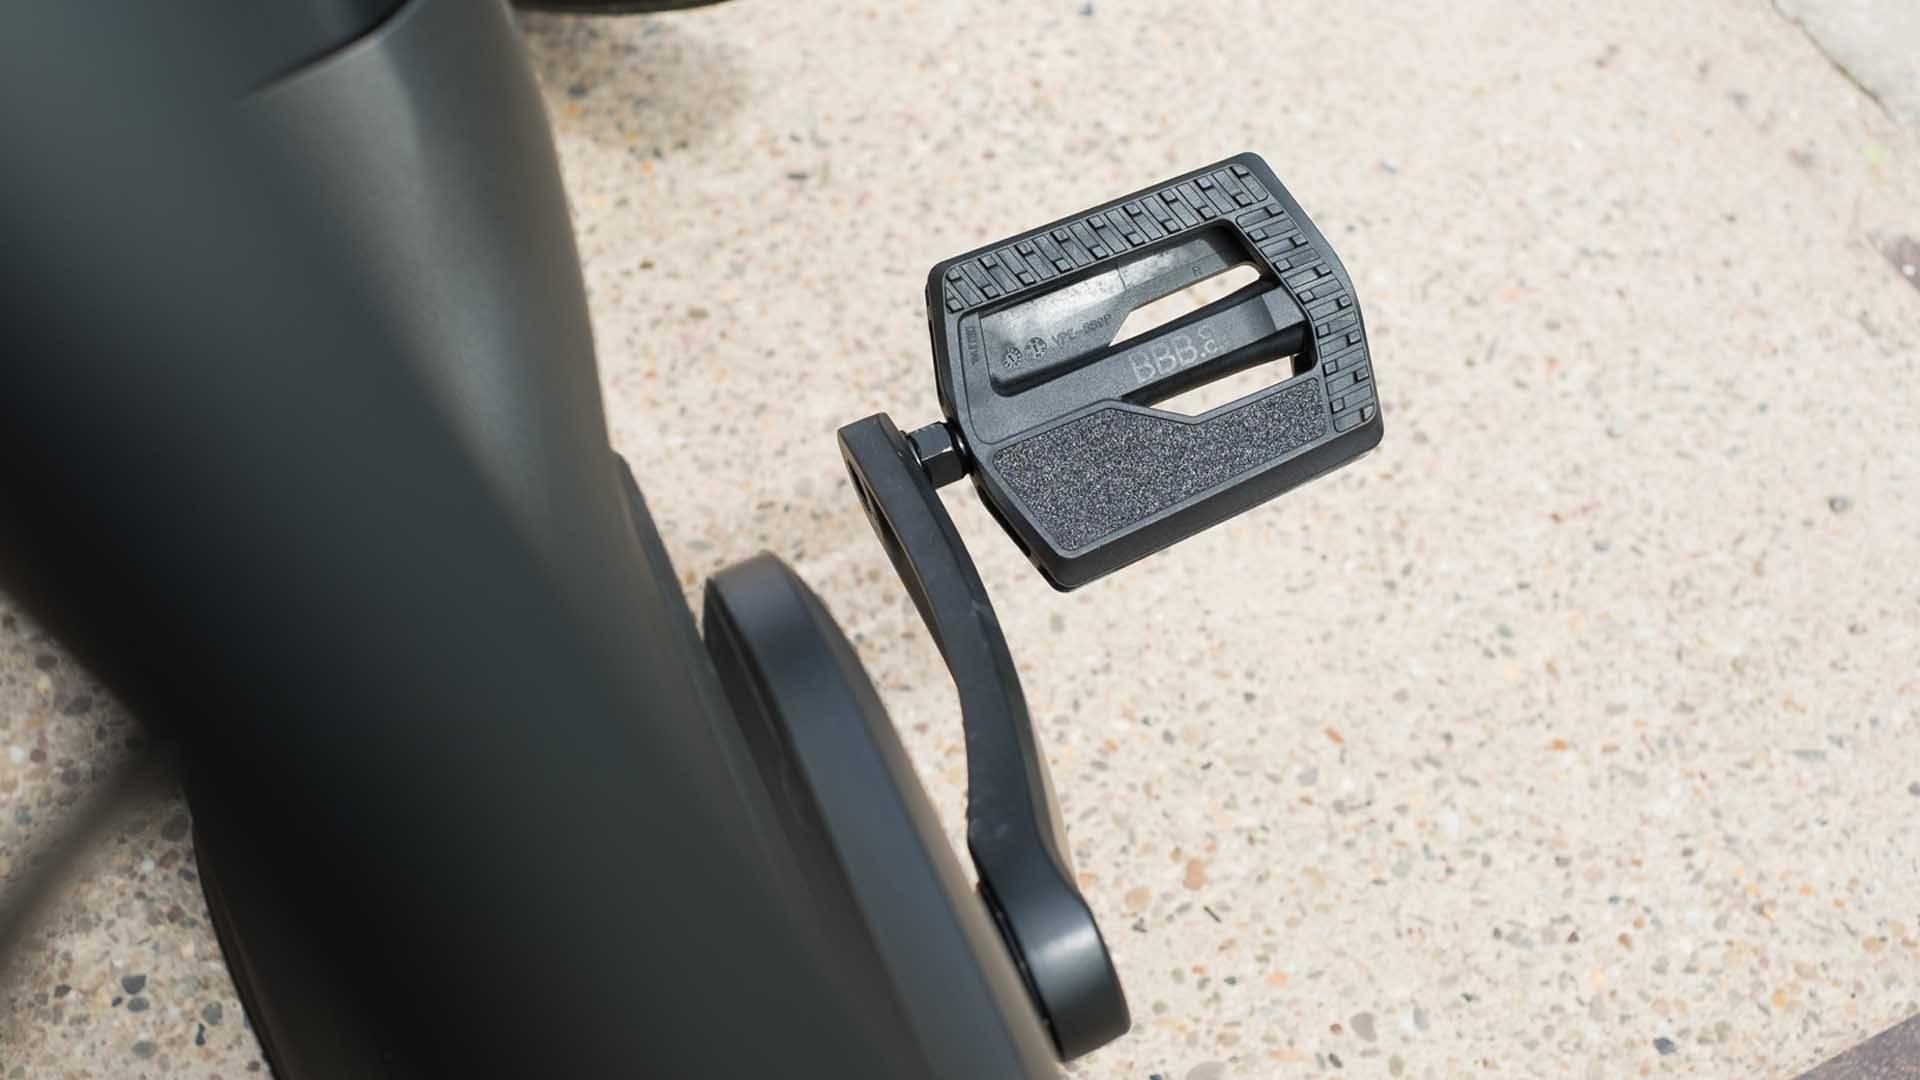 Anti-slip surface